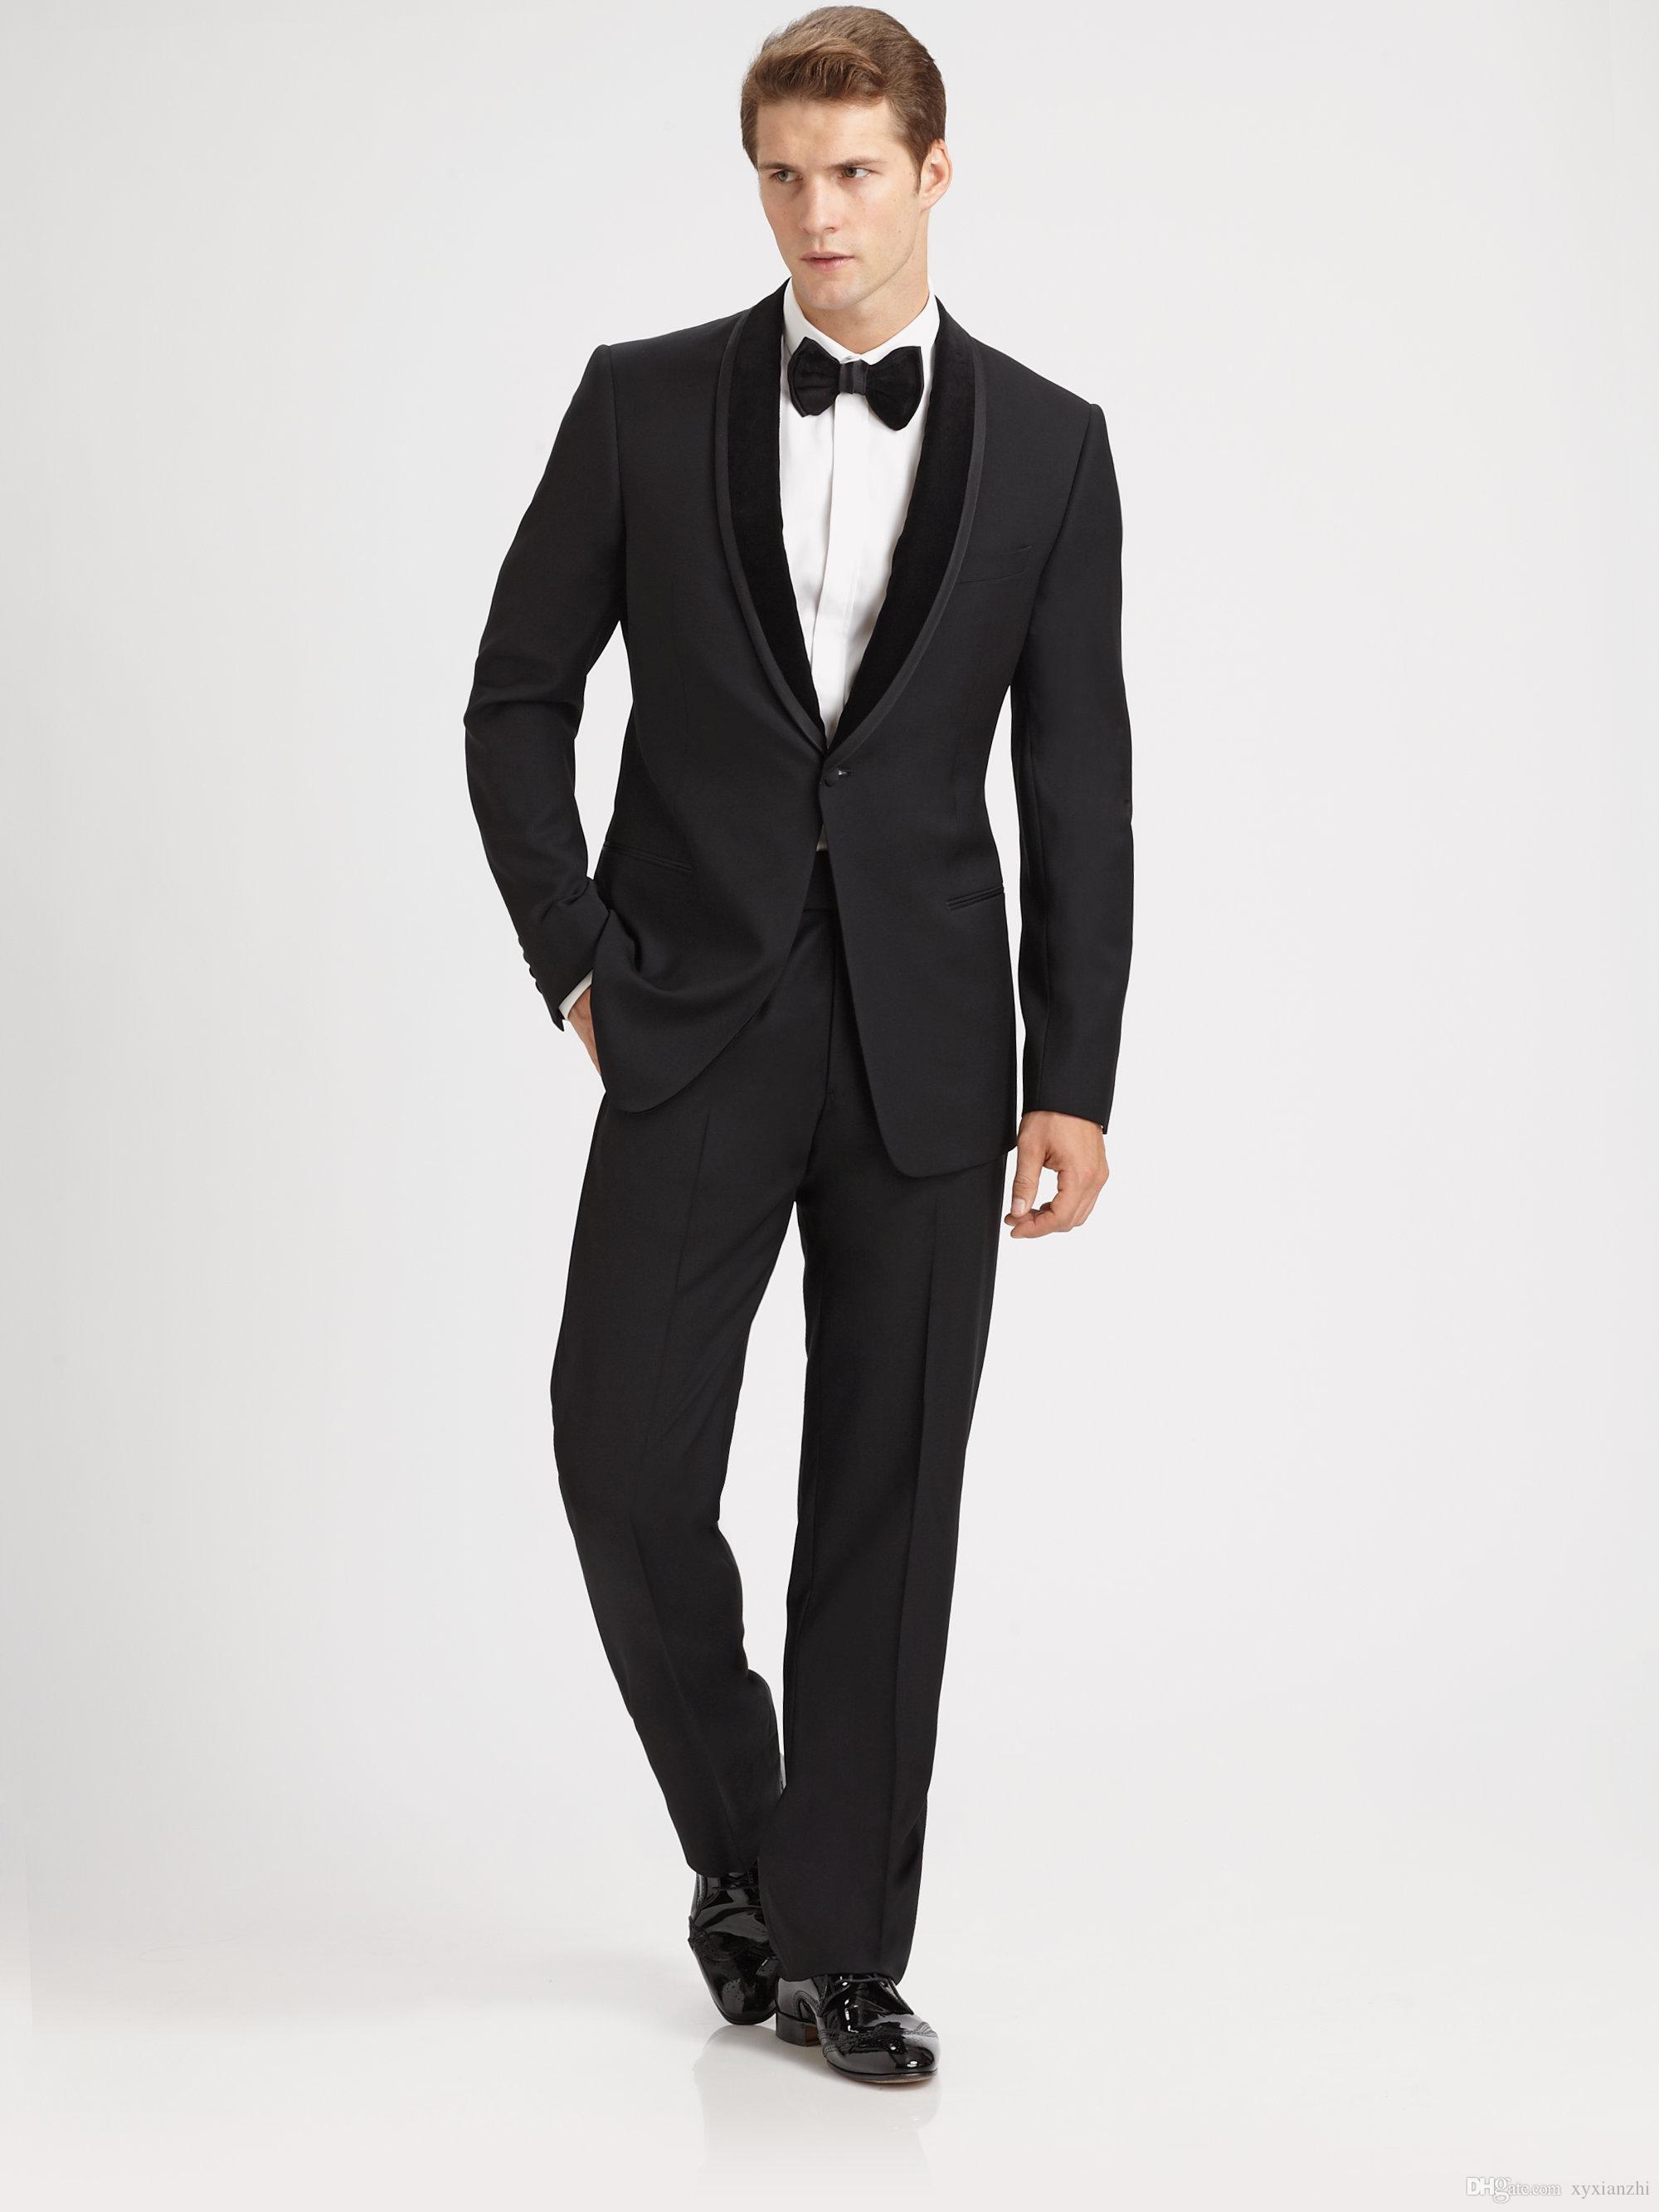 dress wedding tuxedo for groom wear slim fit custom made 2020 suit black two piece suits jacket